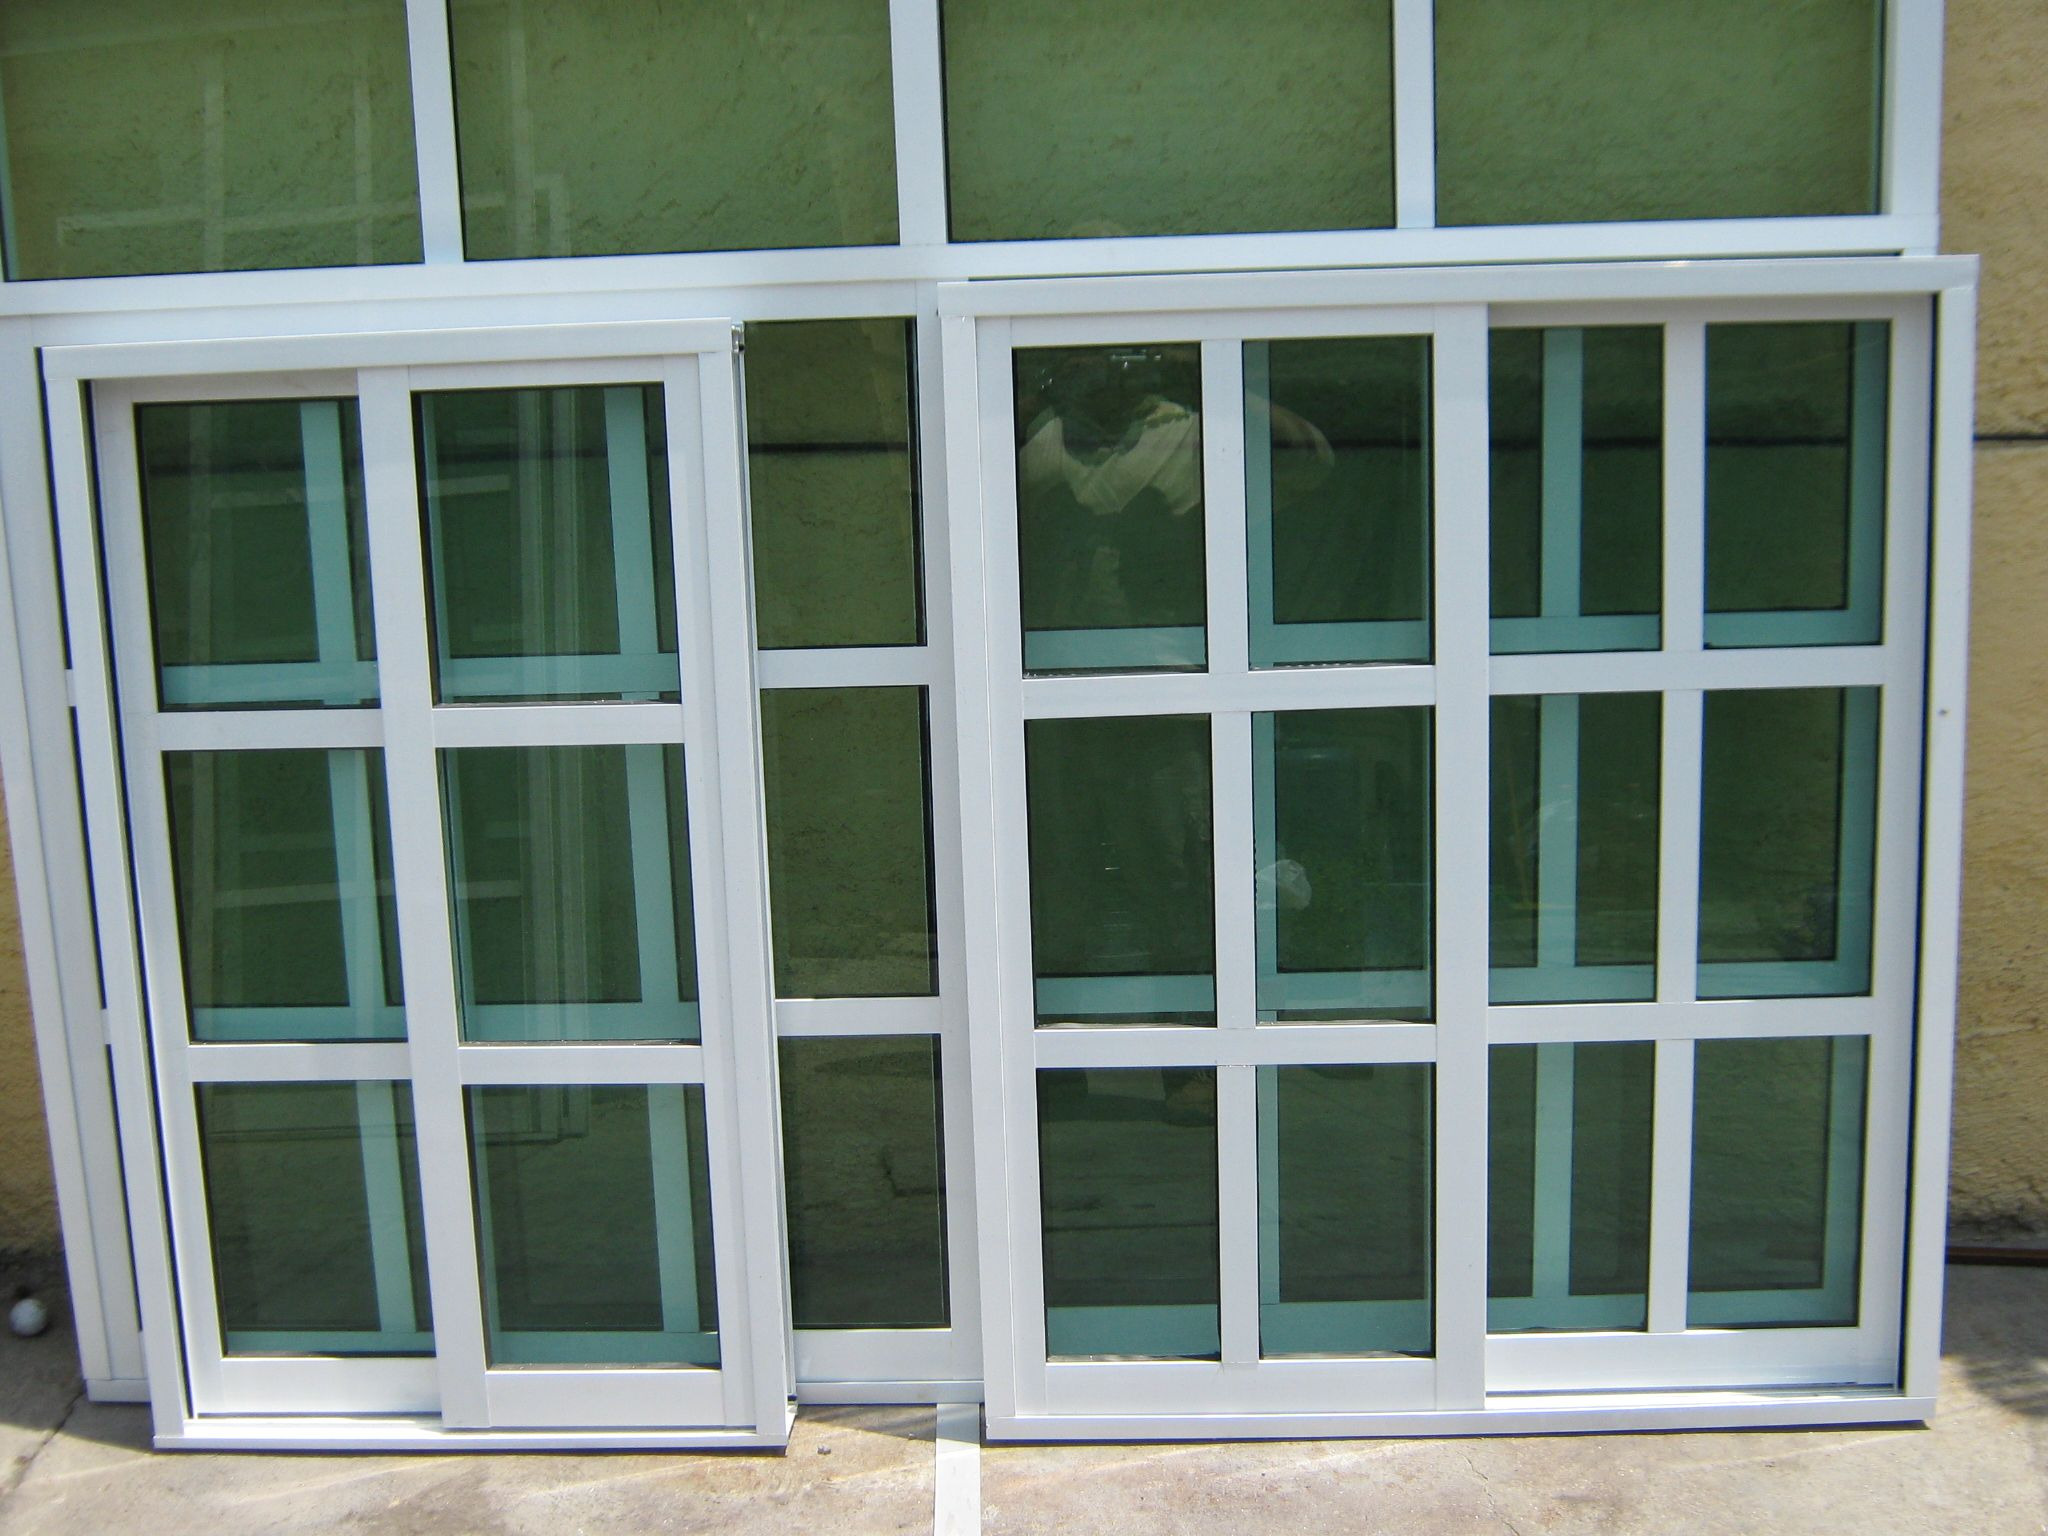 Ventanas de aluminio puertas pinterest ventanas de for Colores de aluminio para ventanas